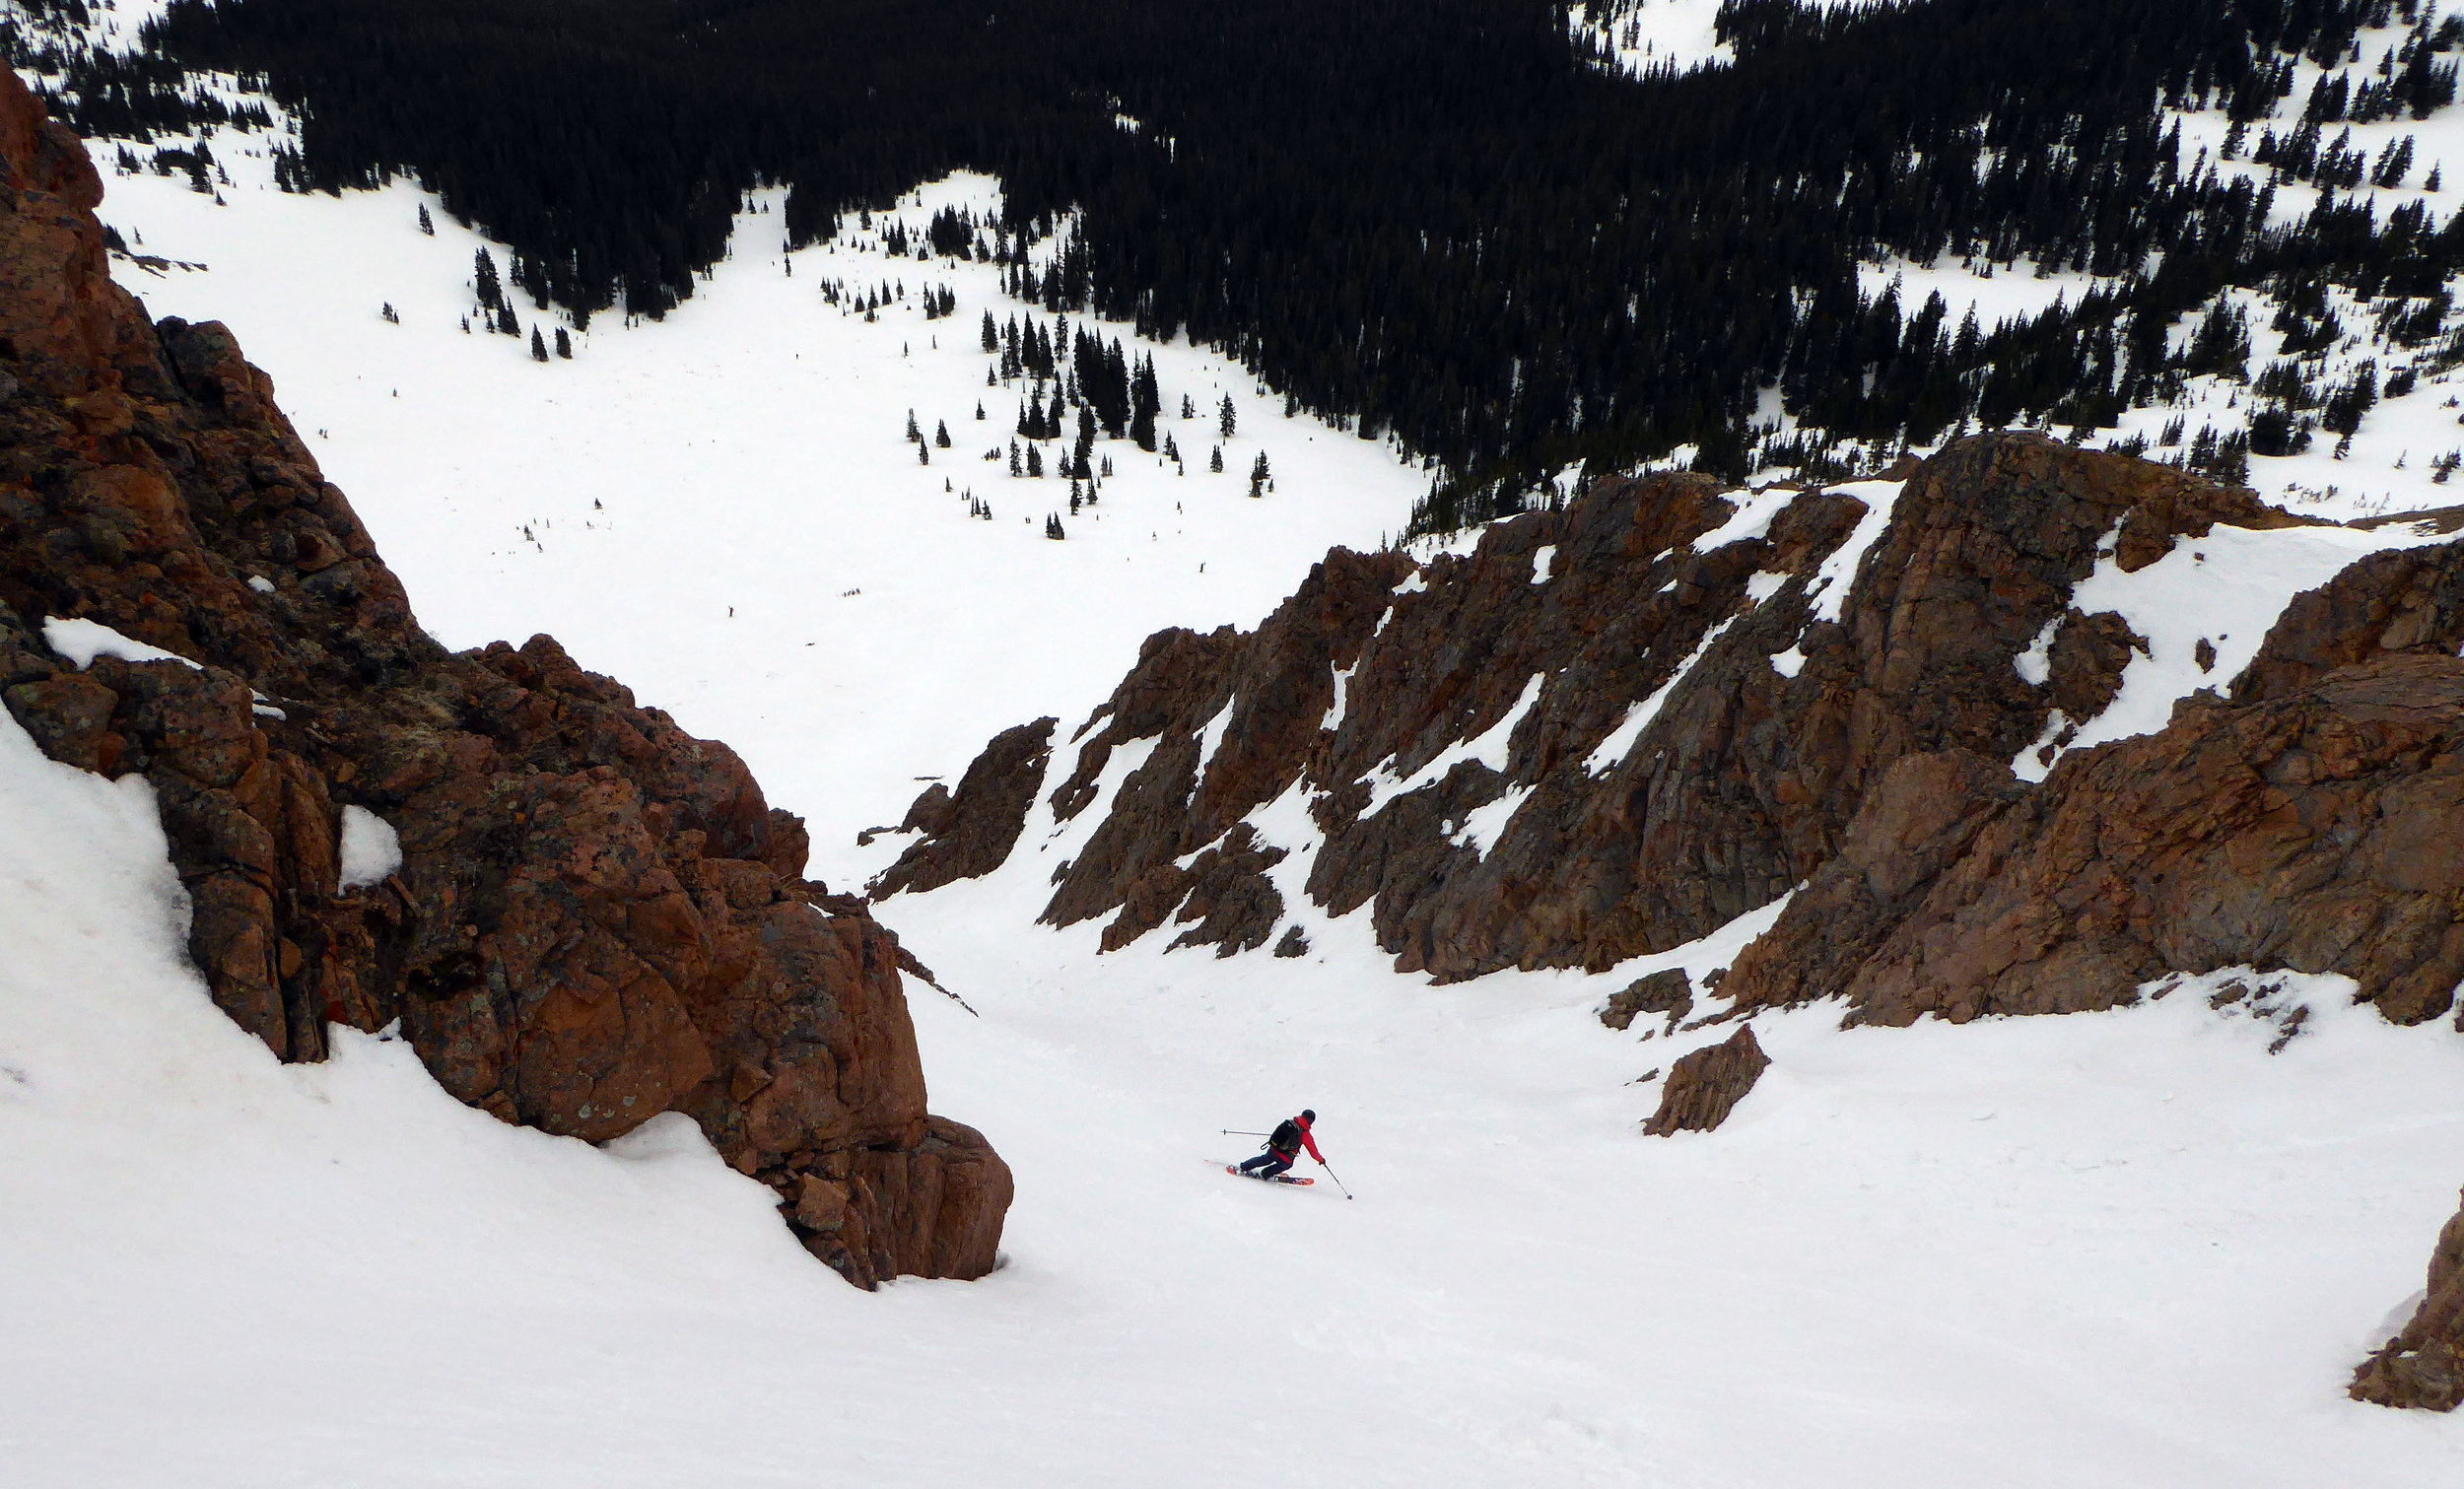 Skiing the Drainpipe.